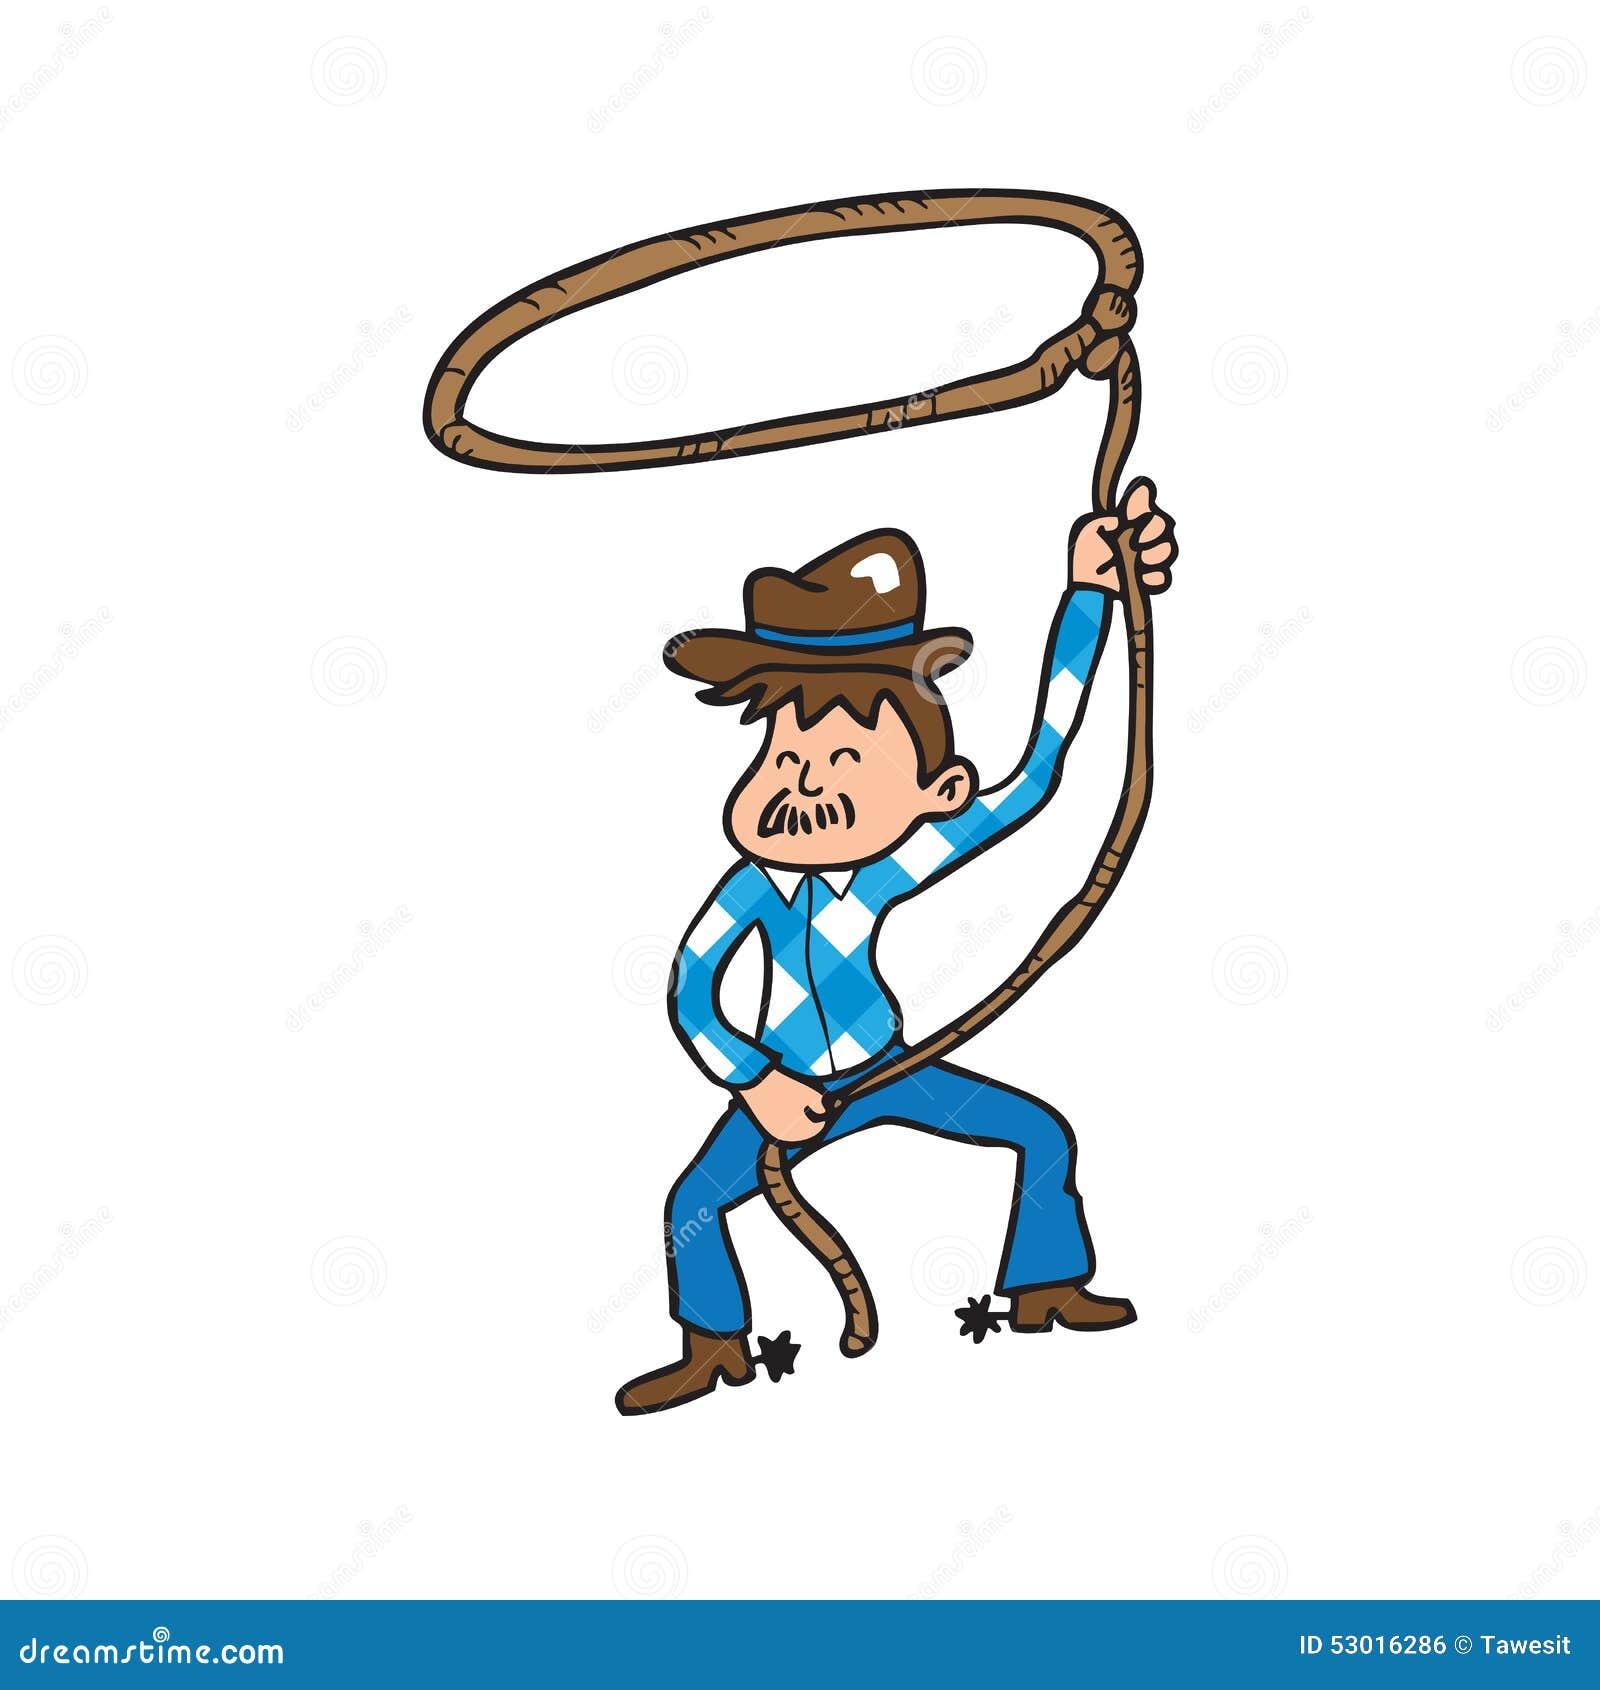 Cowboy Old Man Stock Illustration - Image: 53016286